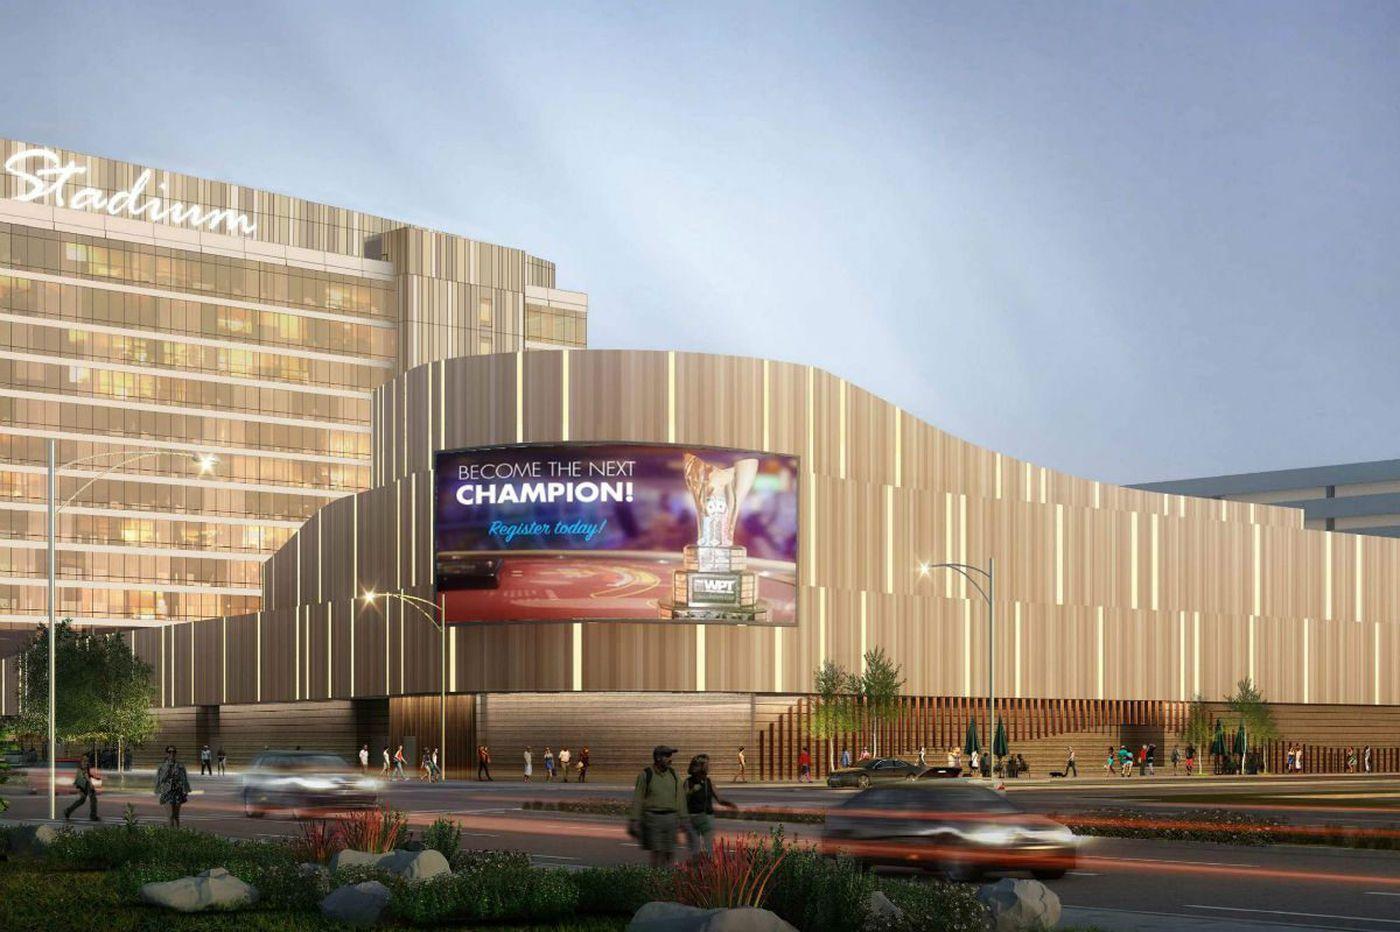 Planners of second Philadelphia casino to prep site near sports stadiums